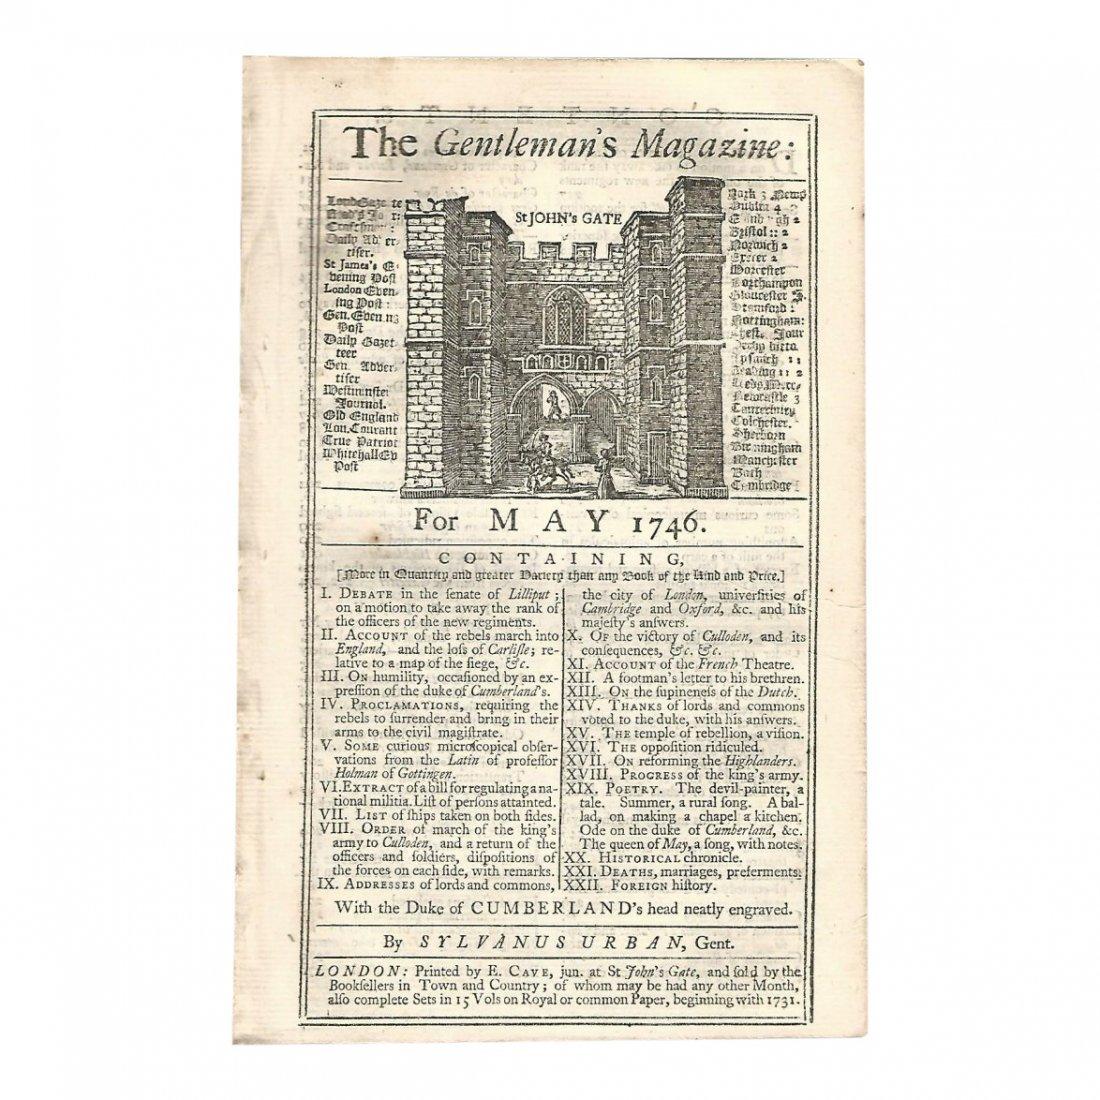 Gentleman's Magazine Battle of Culloden Carlisle, 1746